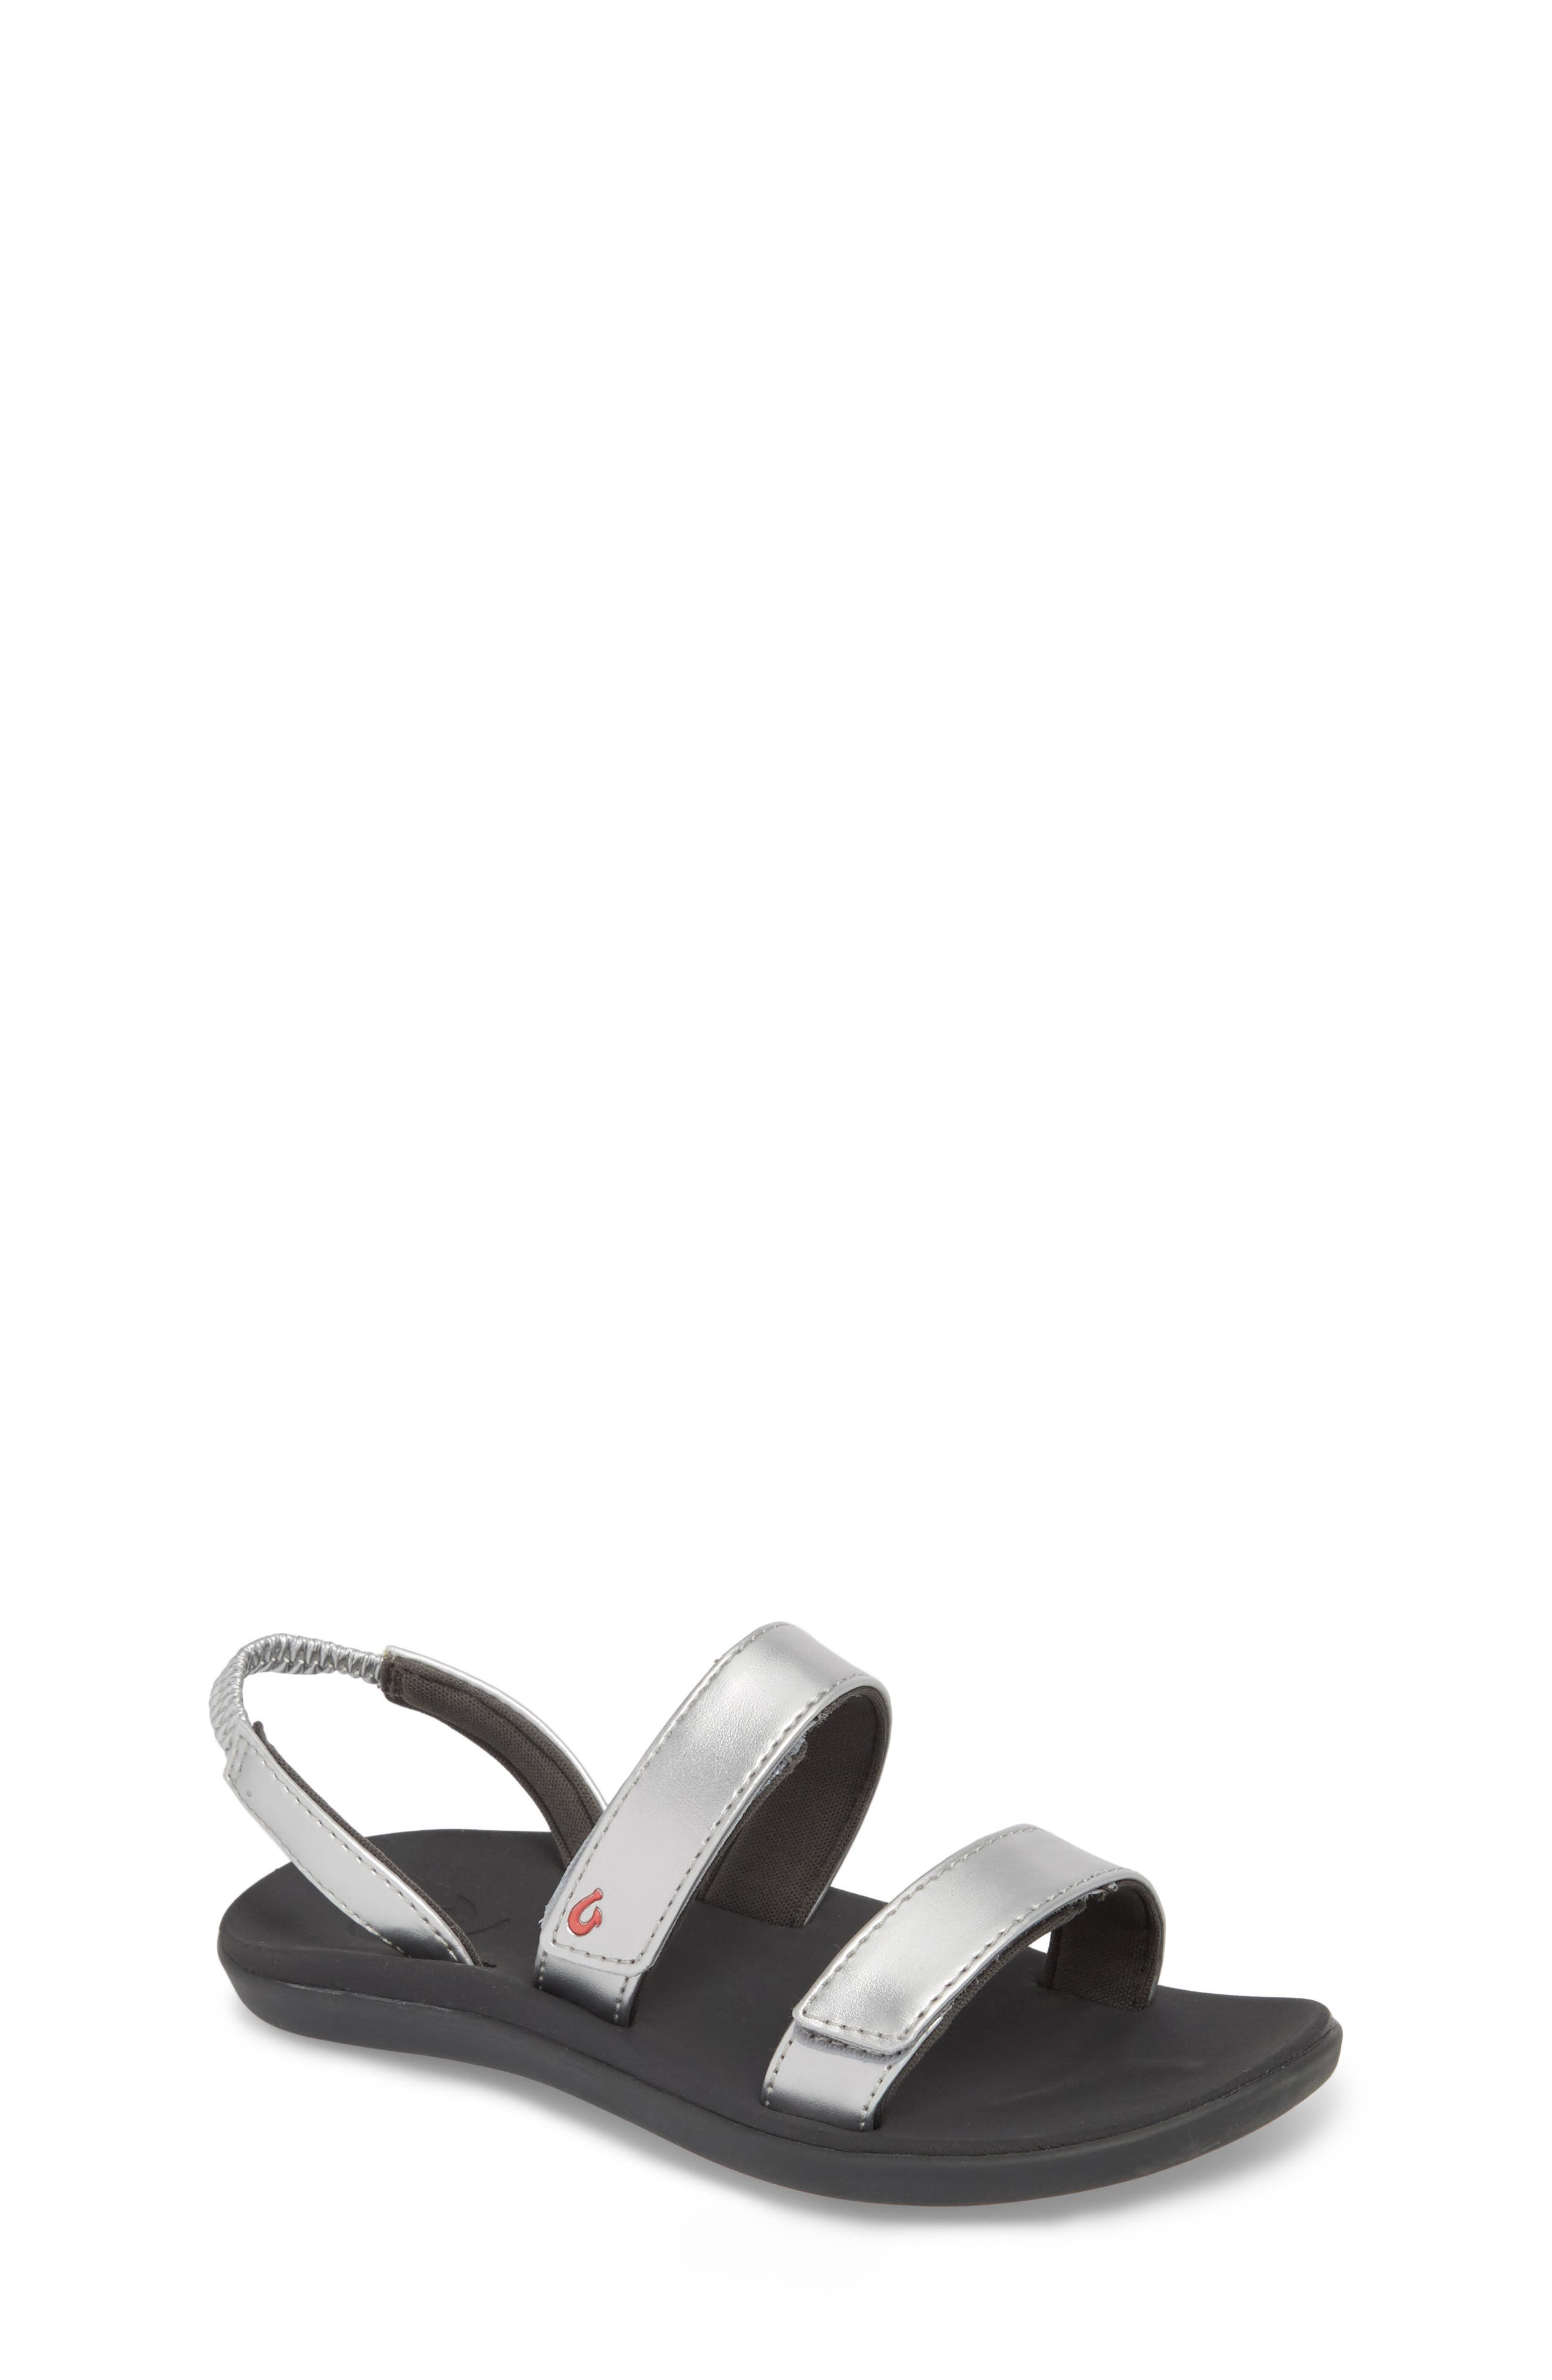 Kipuka Sandal,                         Main,                         color, SILVER/ DARK SHADOW